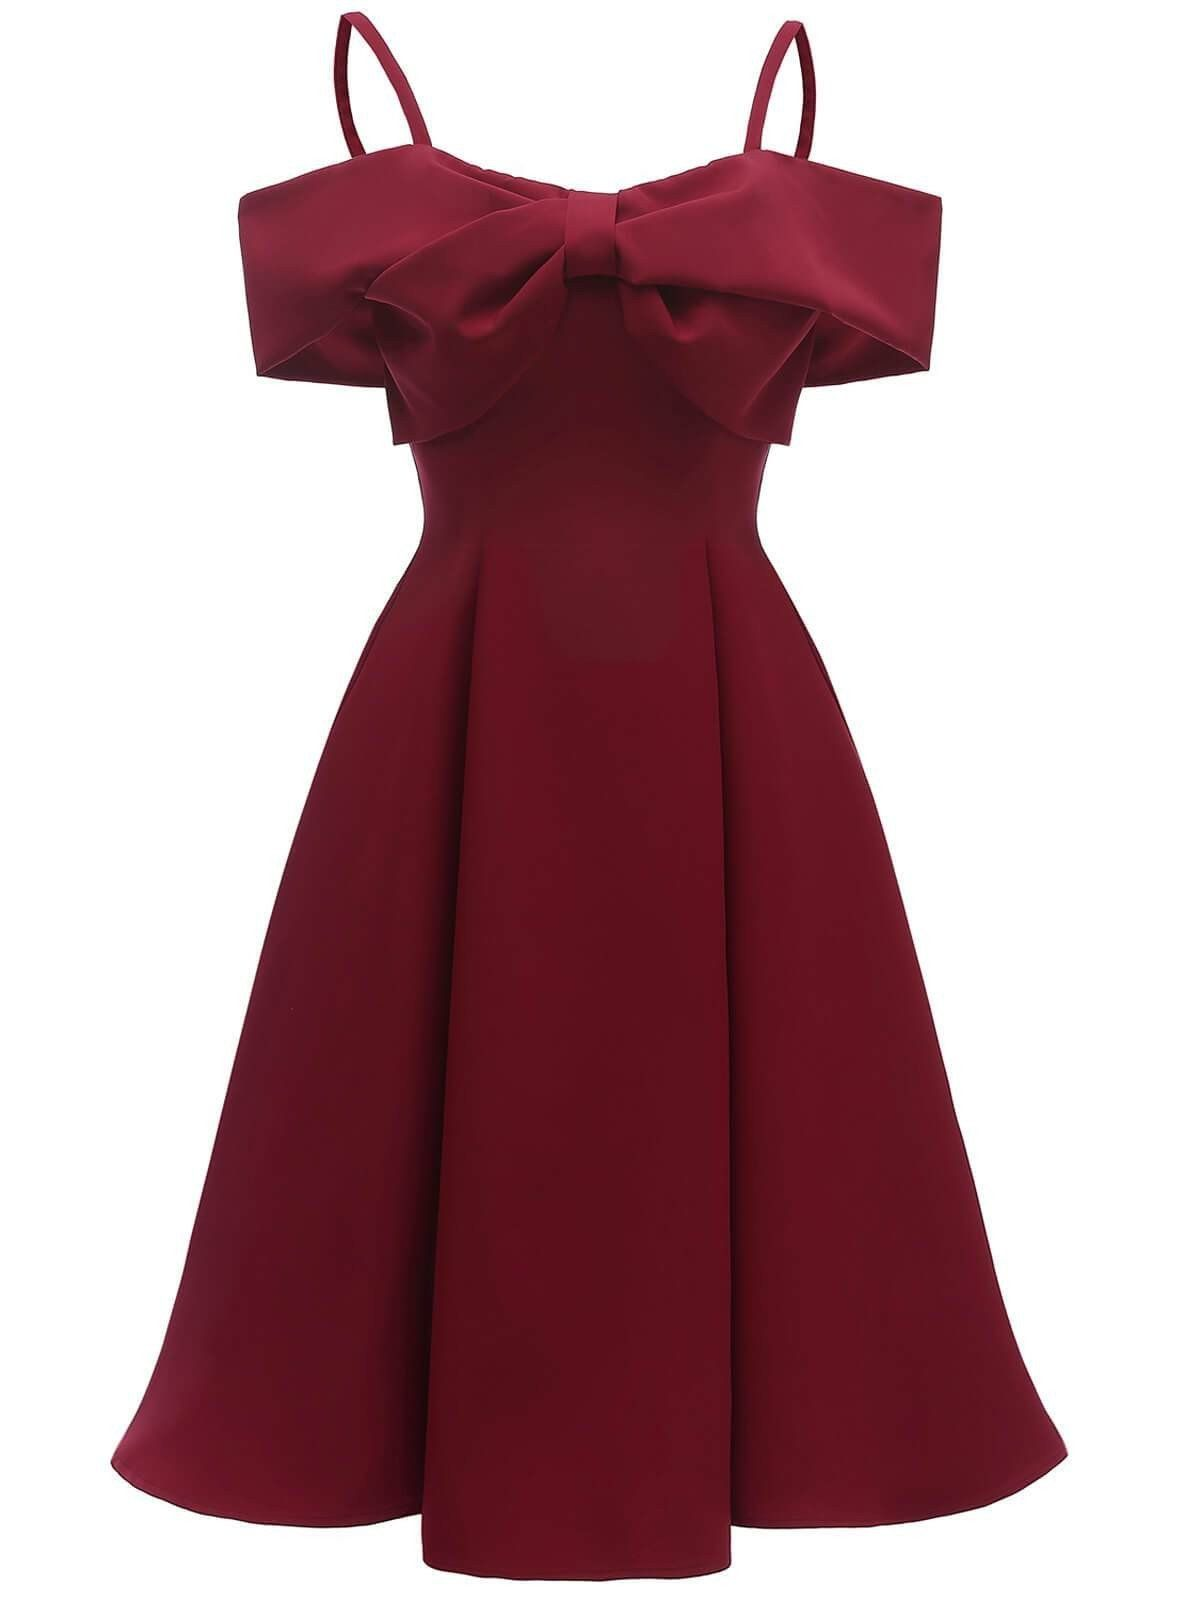 Cold Shoulder Wedding Guest Dress In 2020 Retro Bridesmaid Dresses A Line Prom Dresses Elegant Midi Dresses